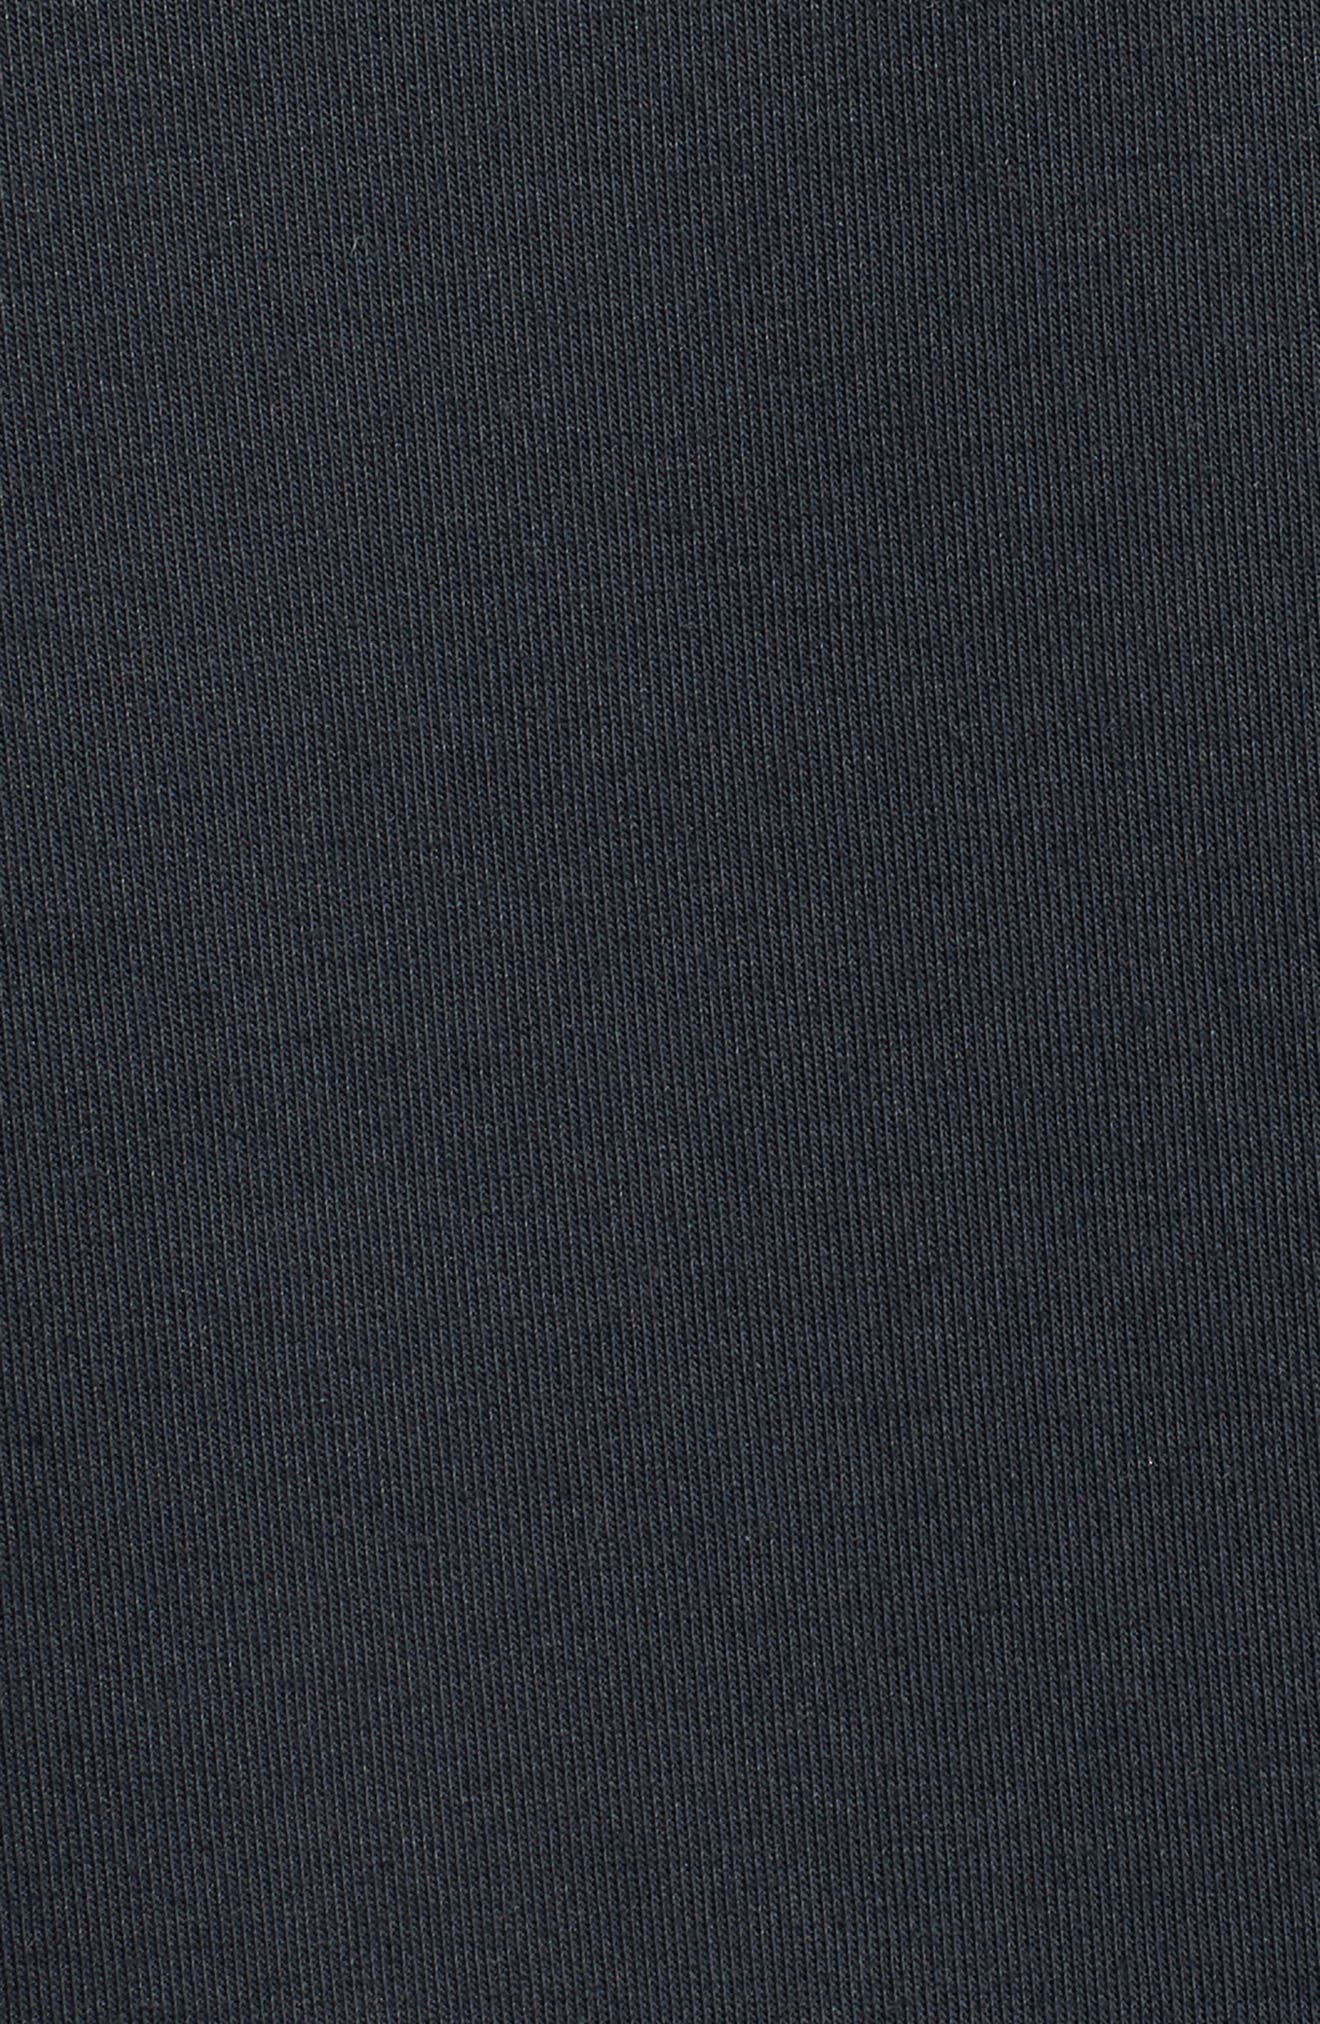 Perpetual ColdGear<sup>®</sup> Reactor Sleeveless Hoodie,                             Alternate thumbnail 5, color,                             Black/ Gray/ Metallic Gold